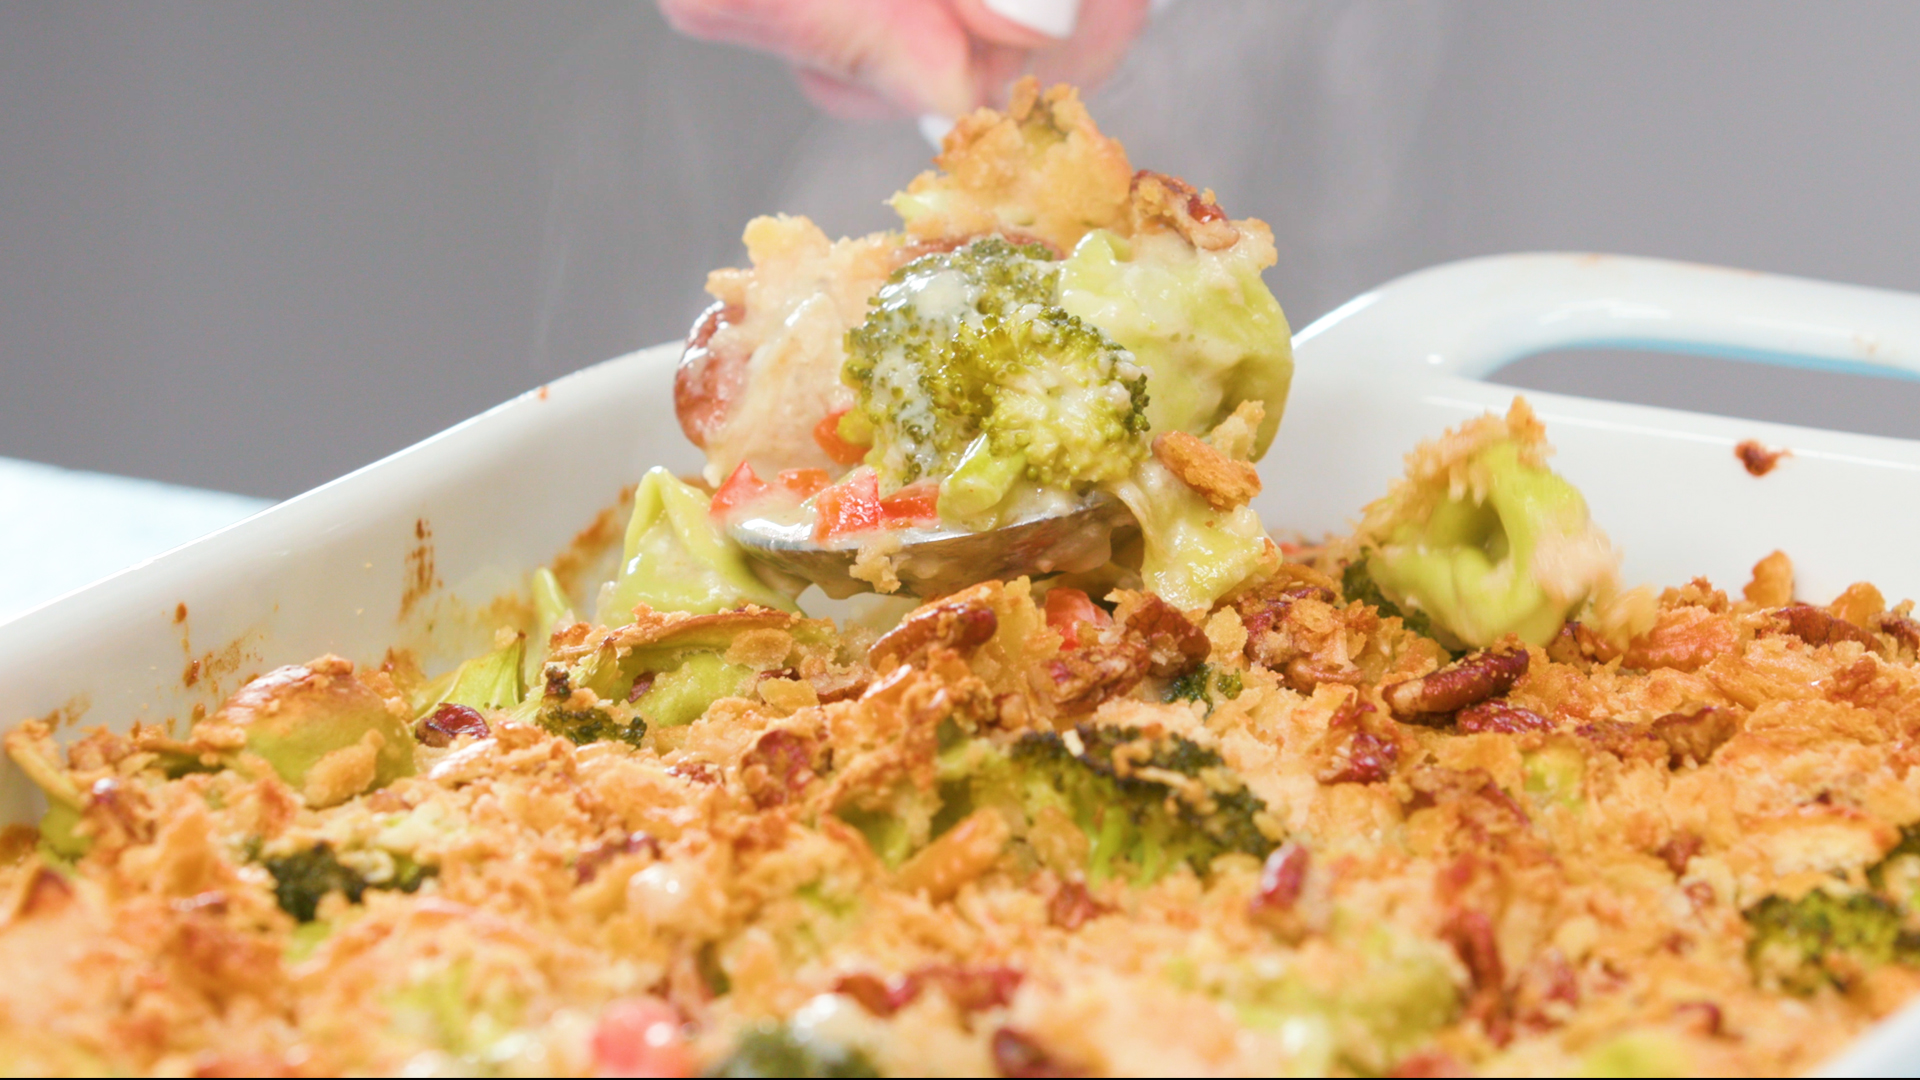 Pasta-Chicken-Broccoli Bake 16x9_1.jpg